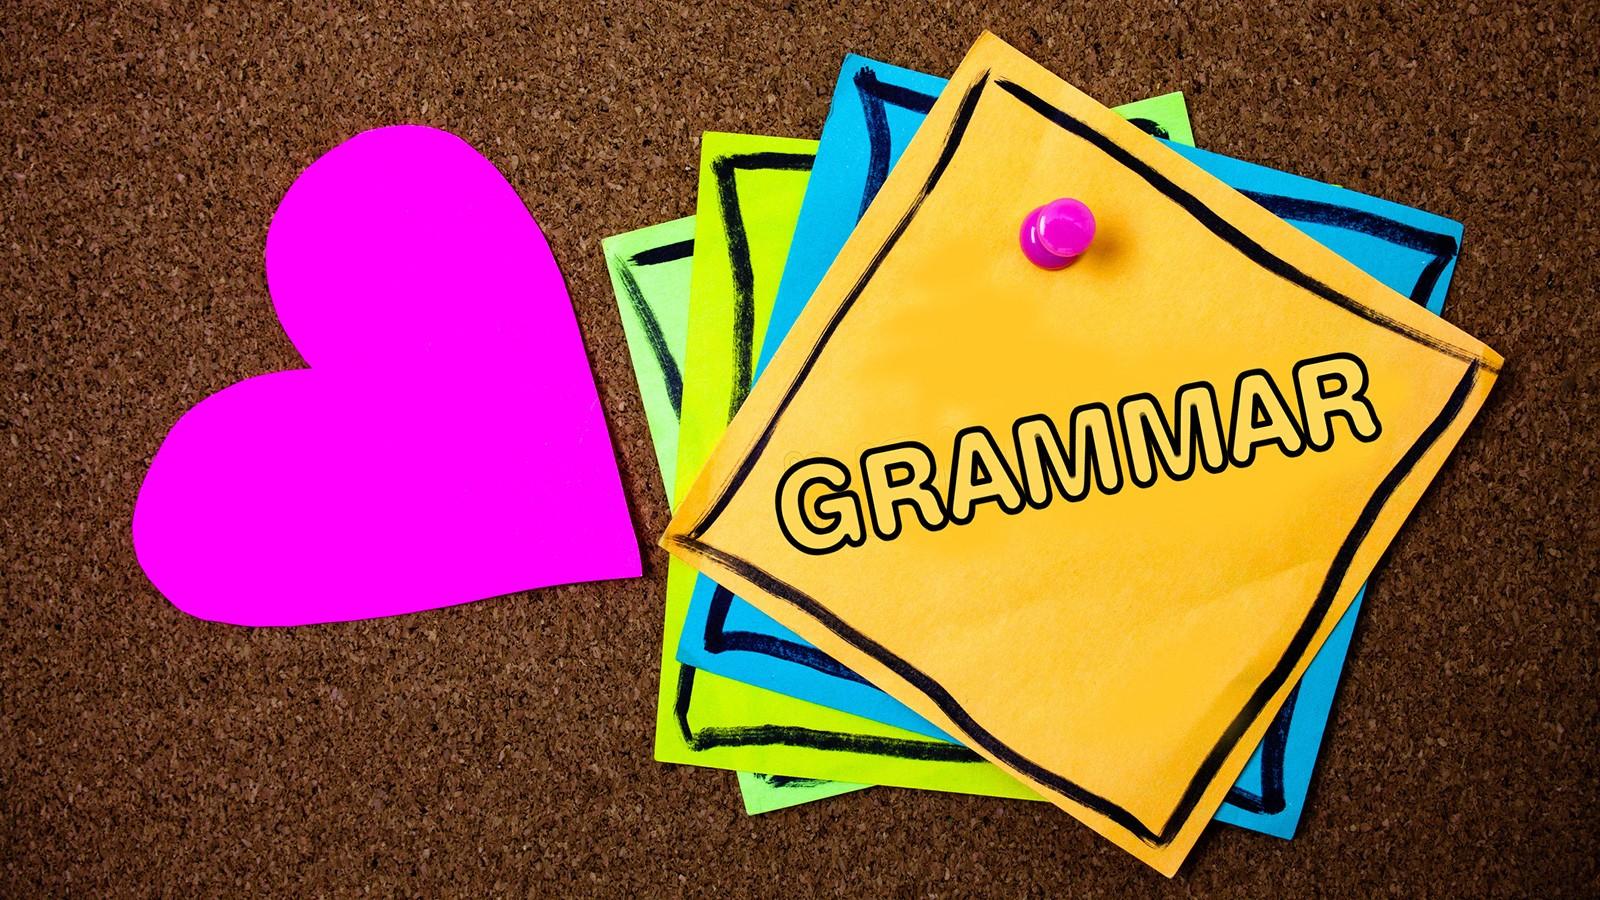 grammar term written on note